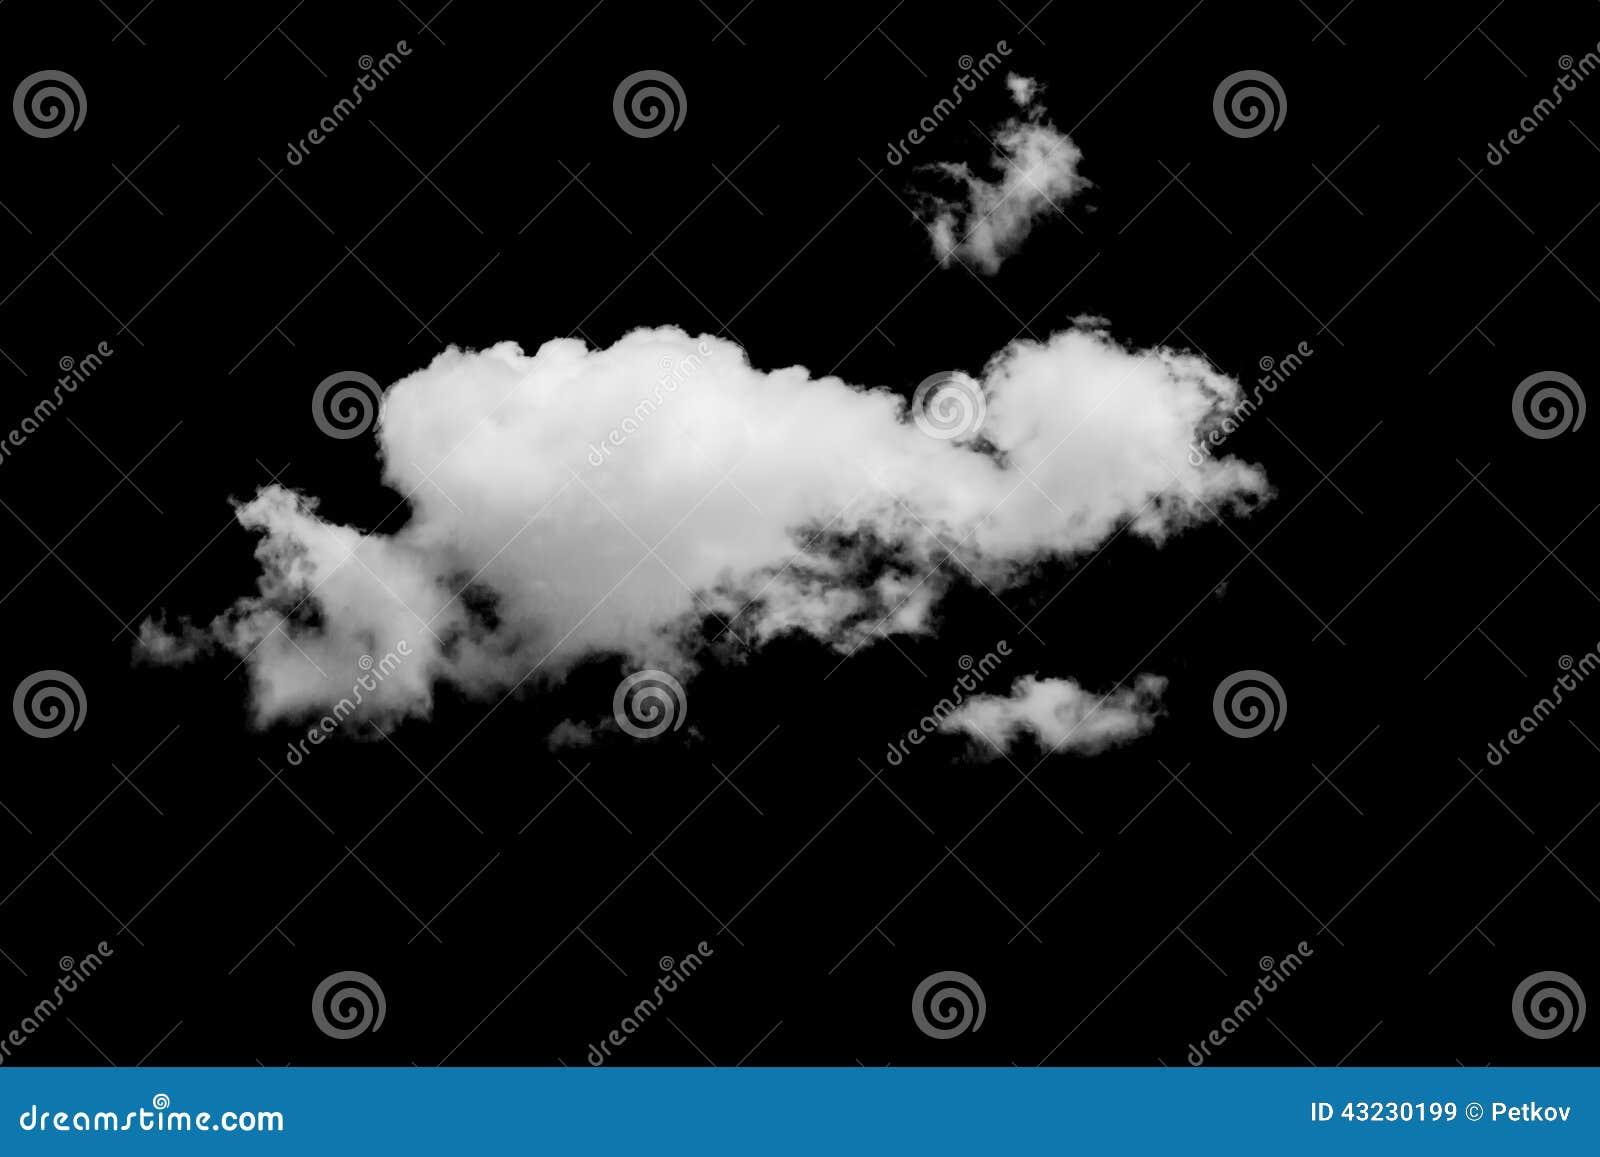 Reeks wolken over zwarte